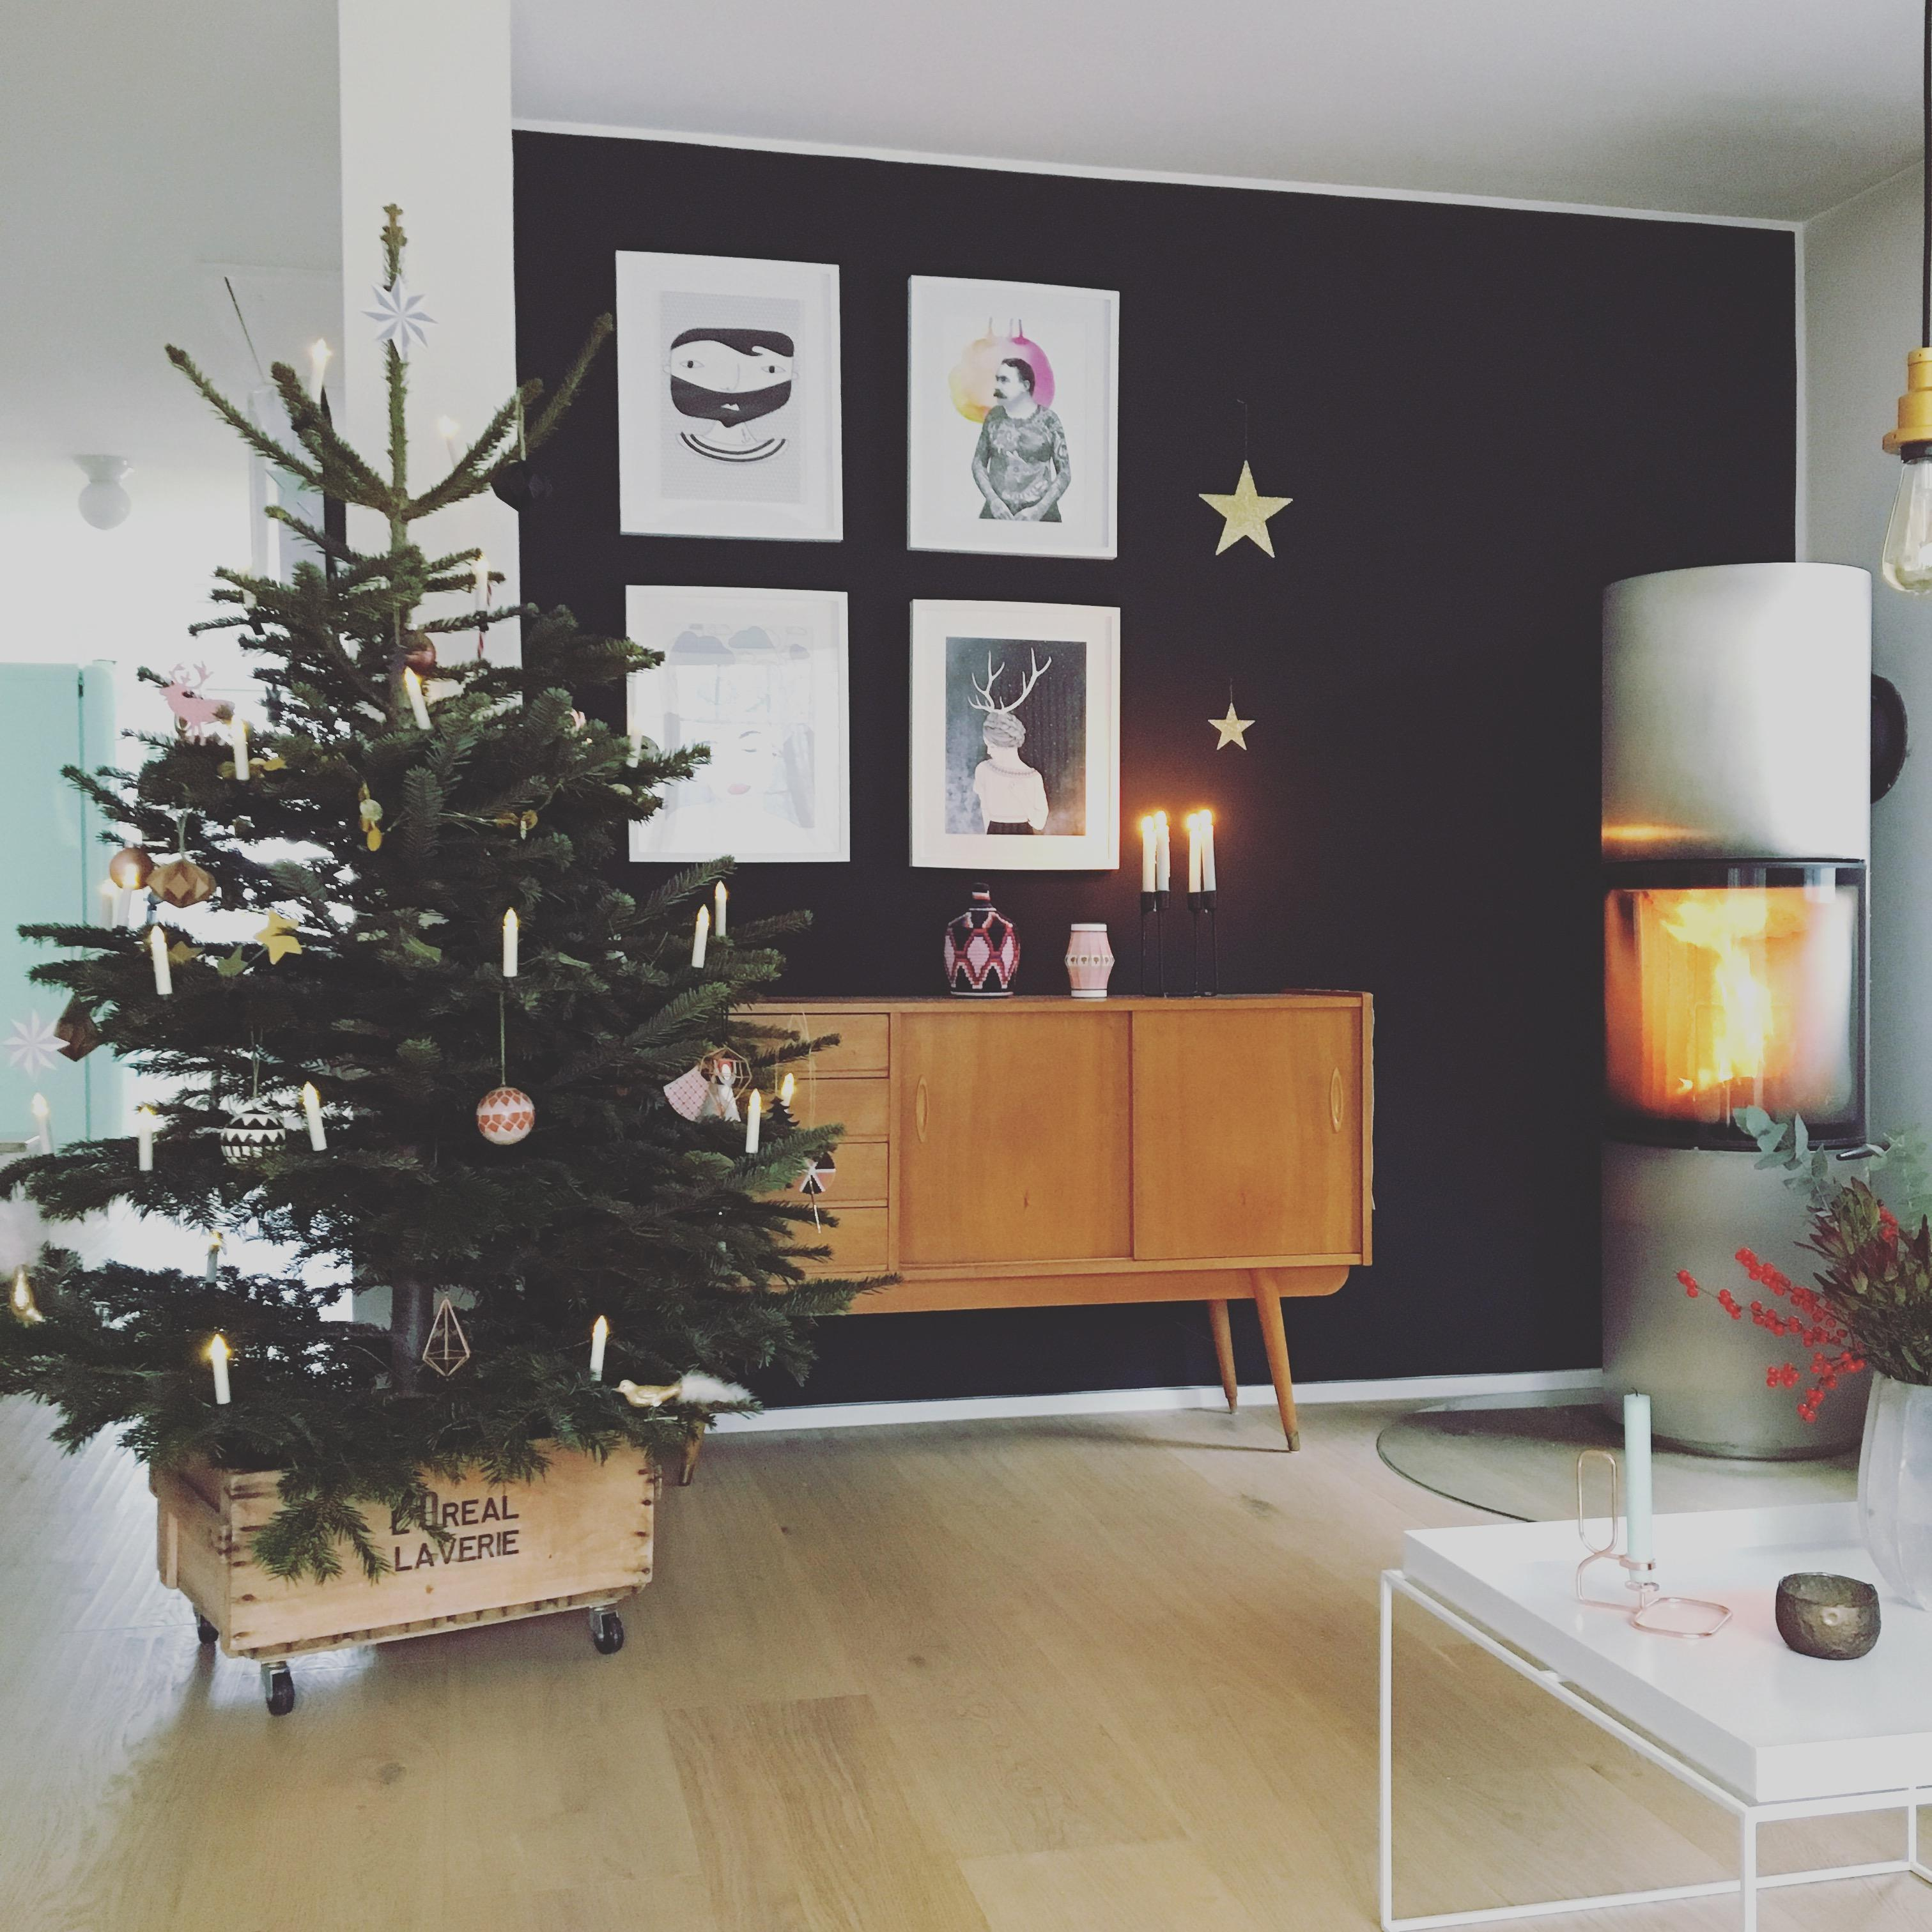 Die Steht Kamin Cozy Be F Cfaa With Kaminofen Ideen